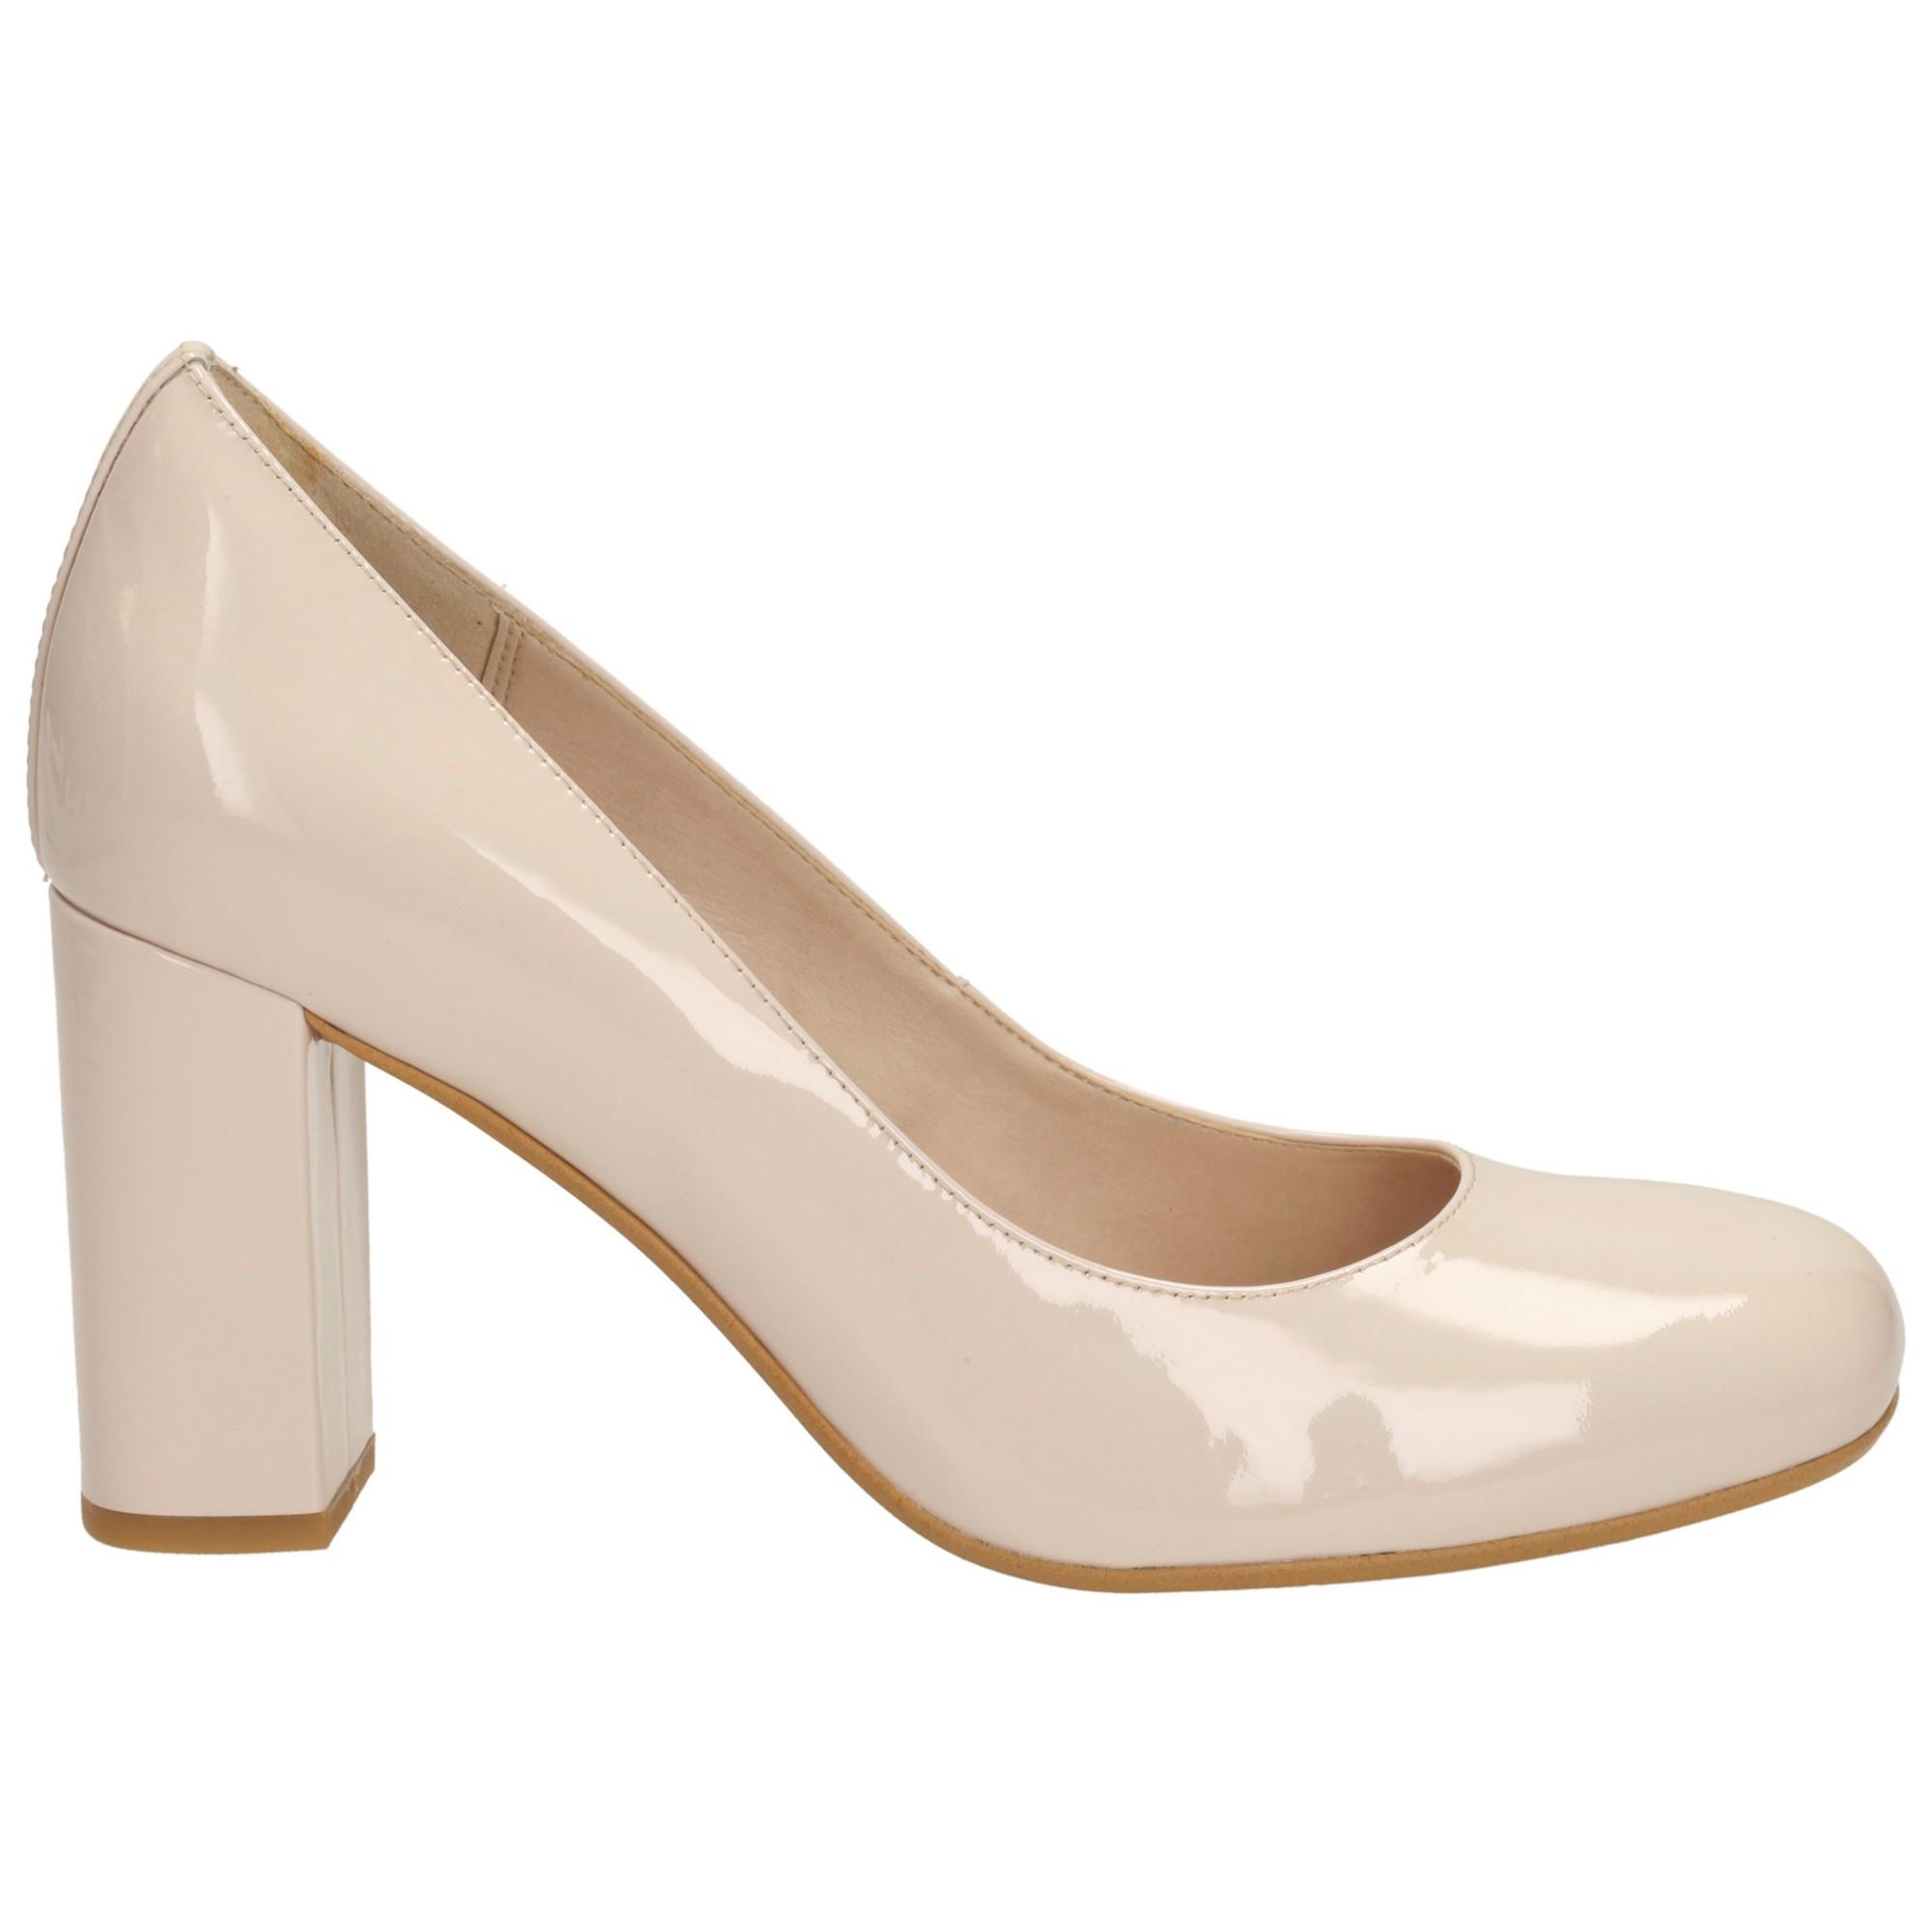 95d0bce6 Clarks Natural Gabriel Mist Block Heel Court Shoes